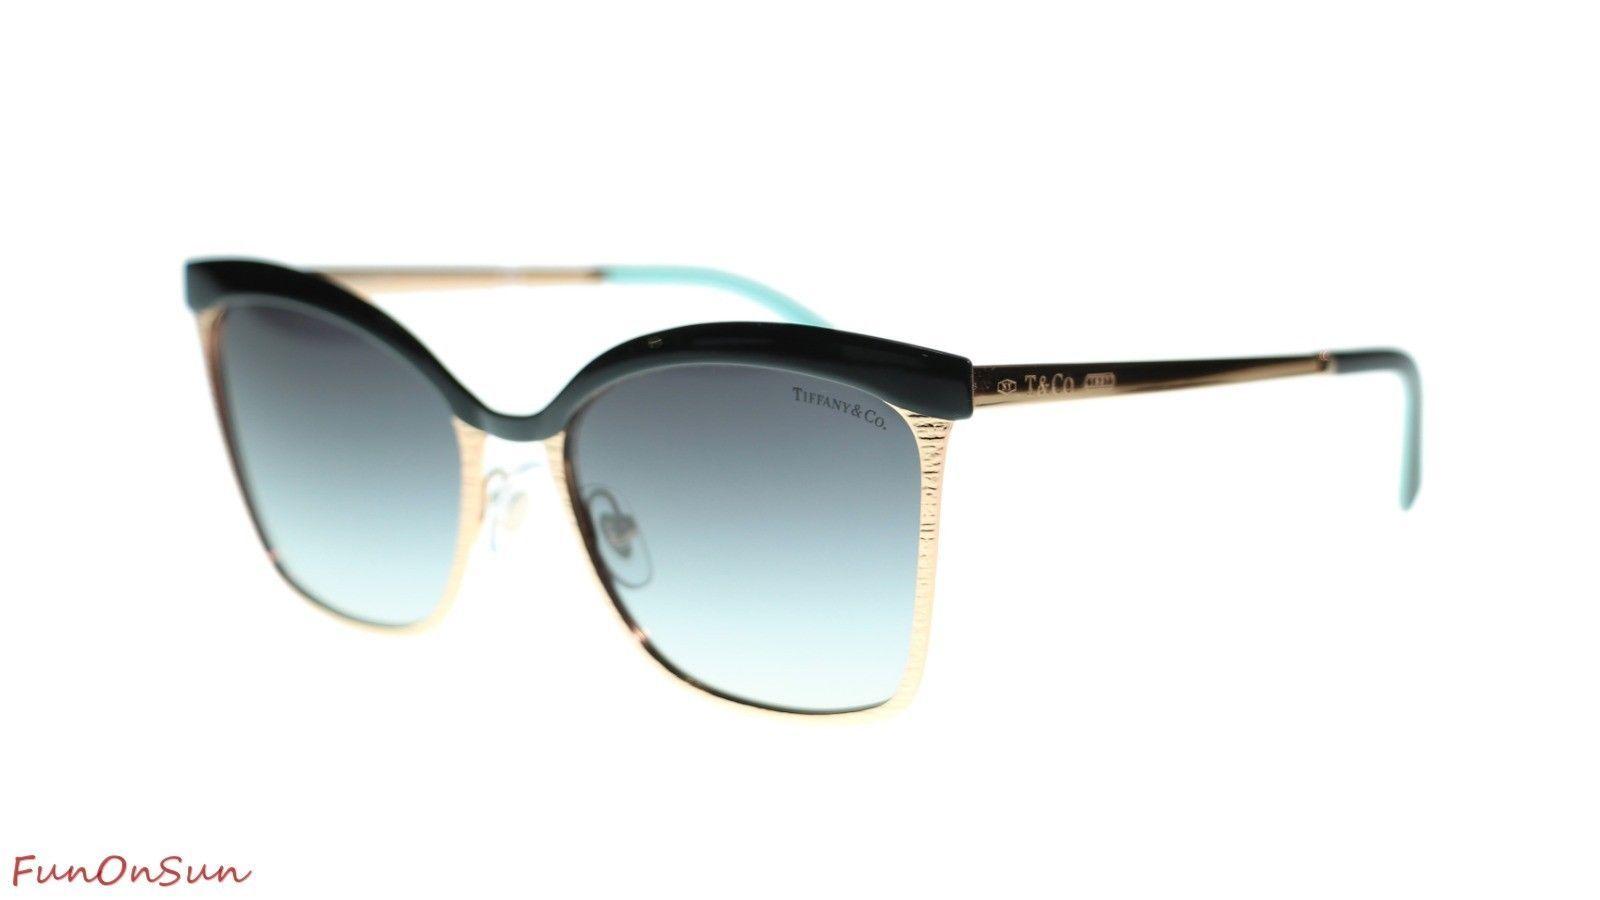 69192f8eb2cb TIFFANY&CO Sunglasses TF3060 61273C Black Rubedo/Grey Gradient Lens 55mm -  $213.40